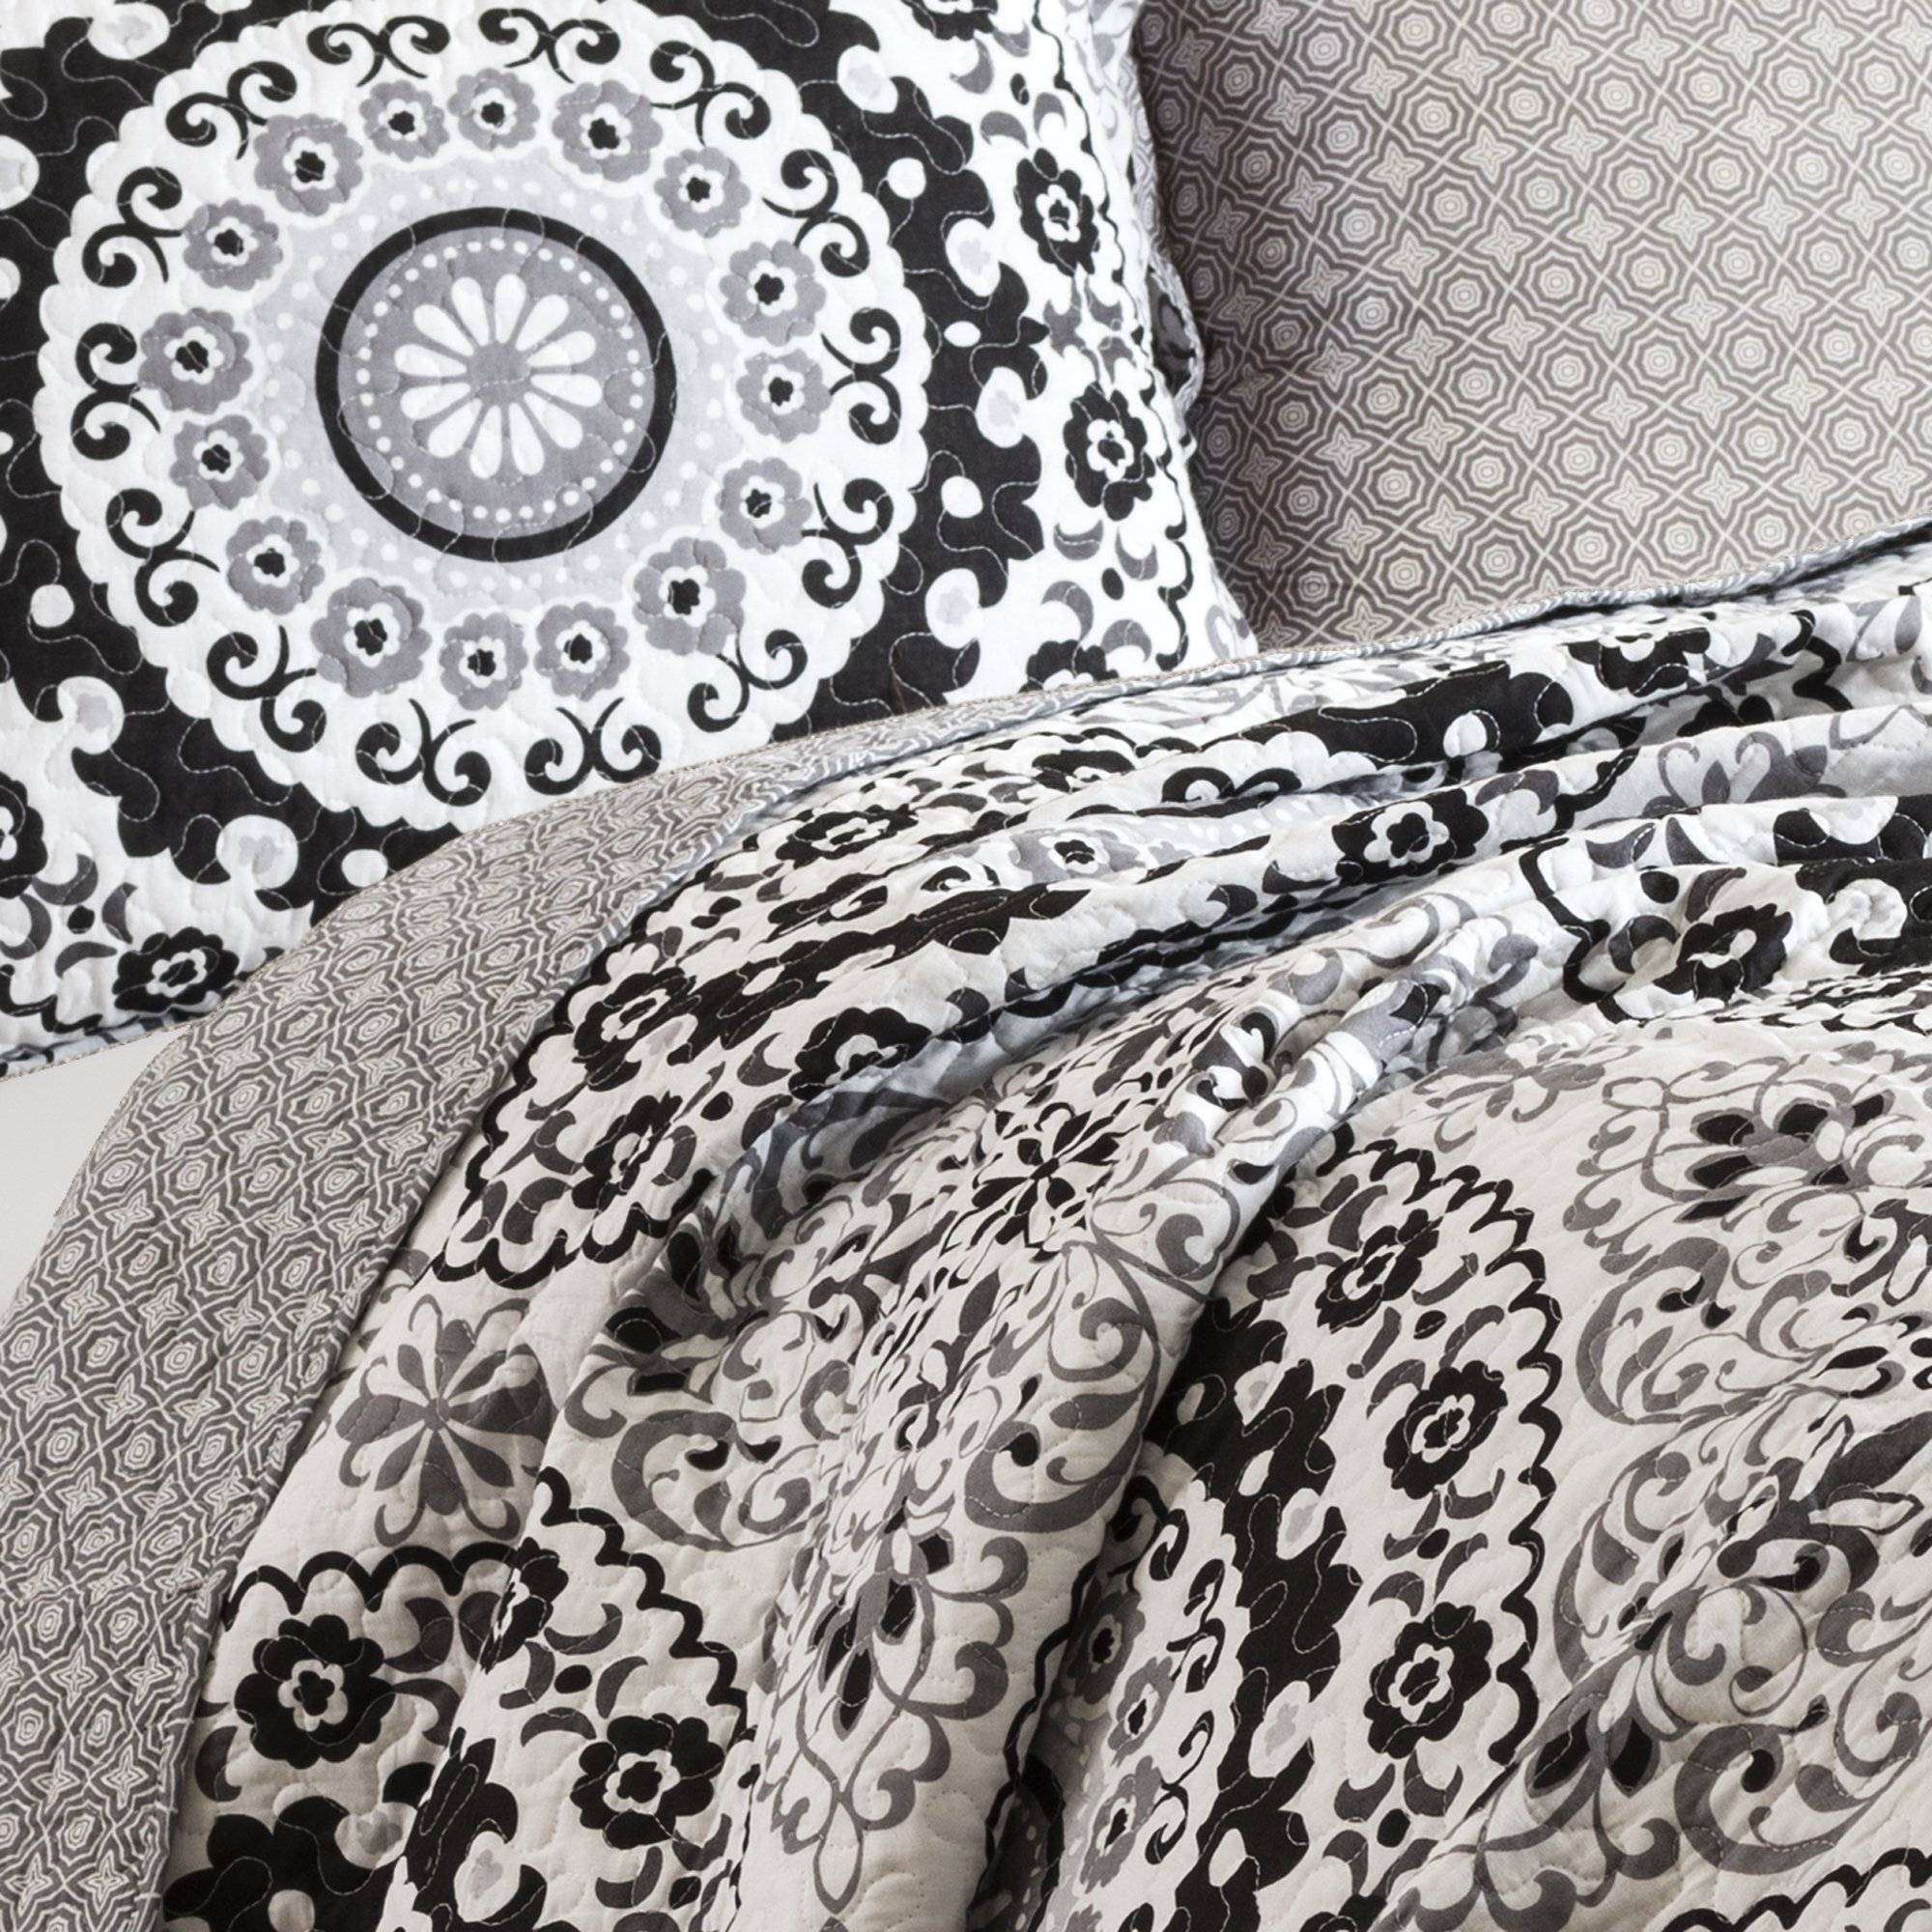 Lush Decor 3 Piece Laurel Wood Circle Quilt Set, Full/Queen, Gray/Black by Lush Decor (Image #2)